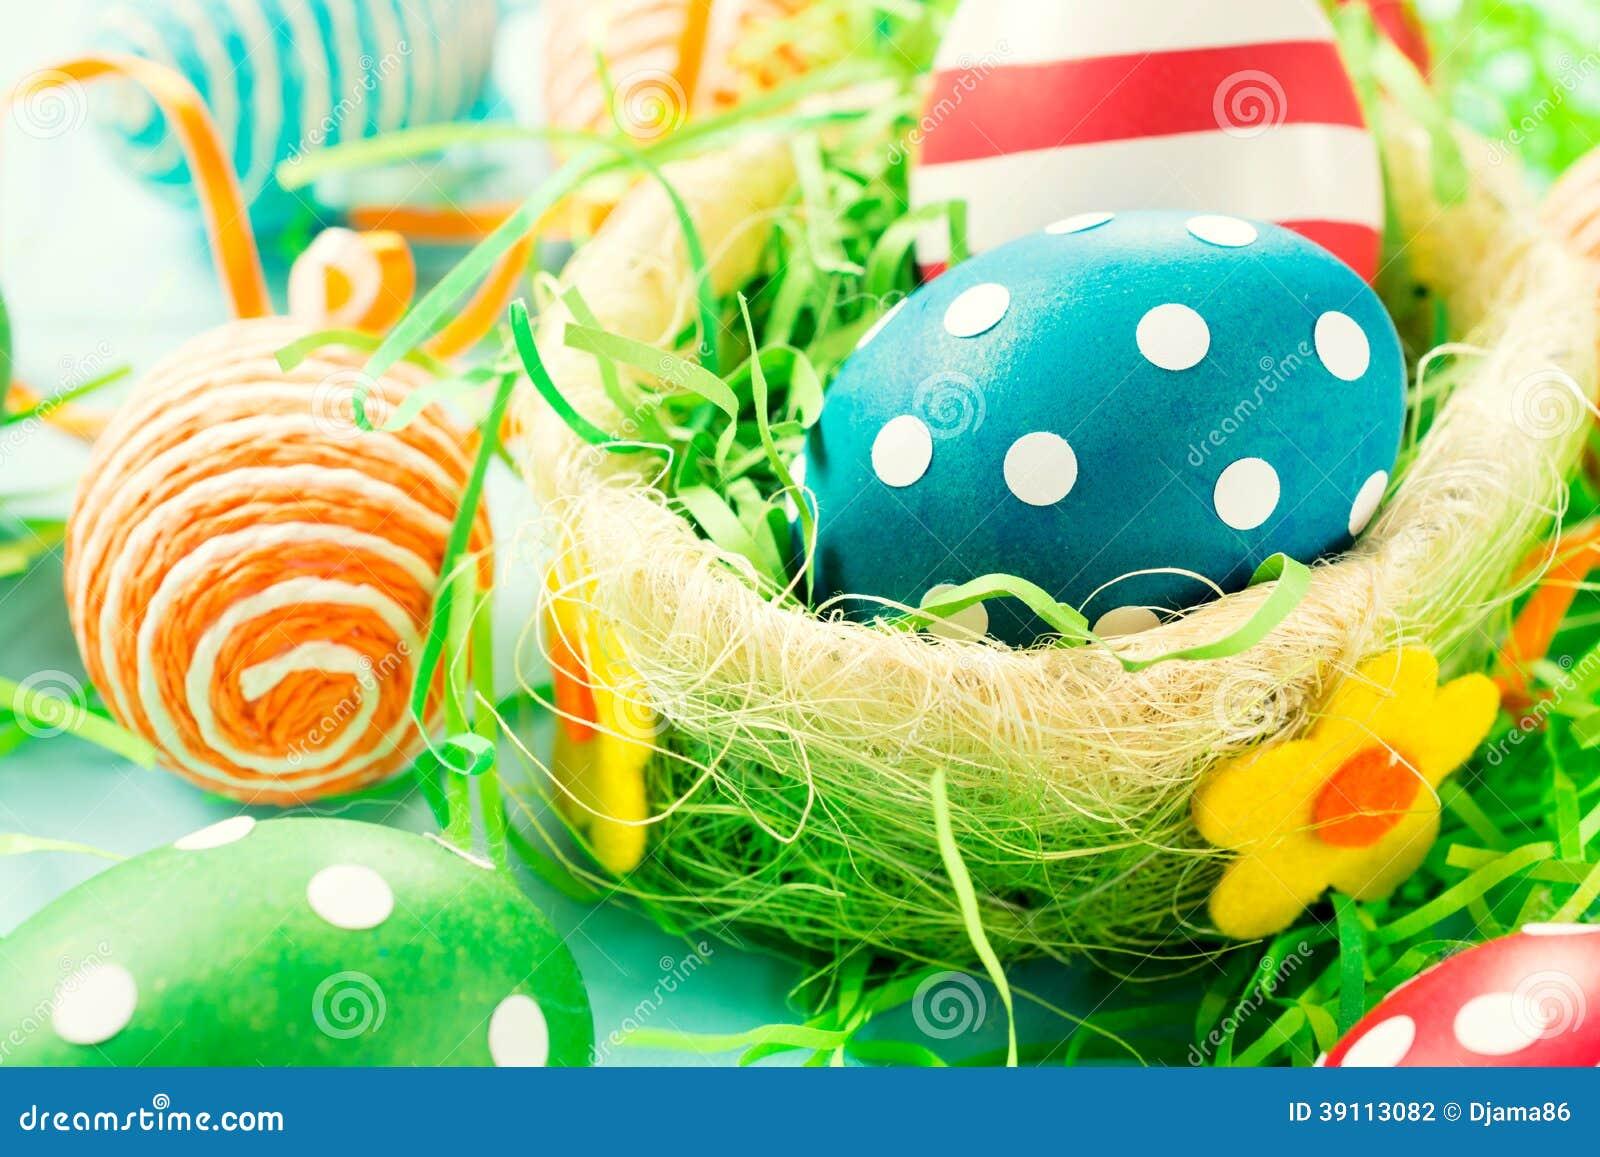 Creatieve eieren in mand